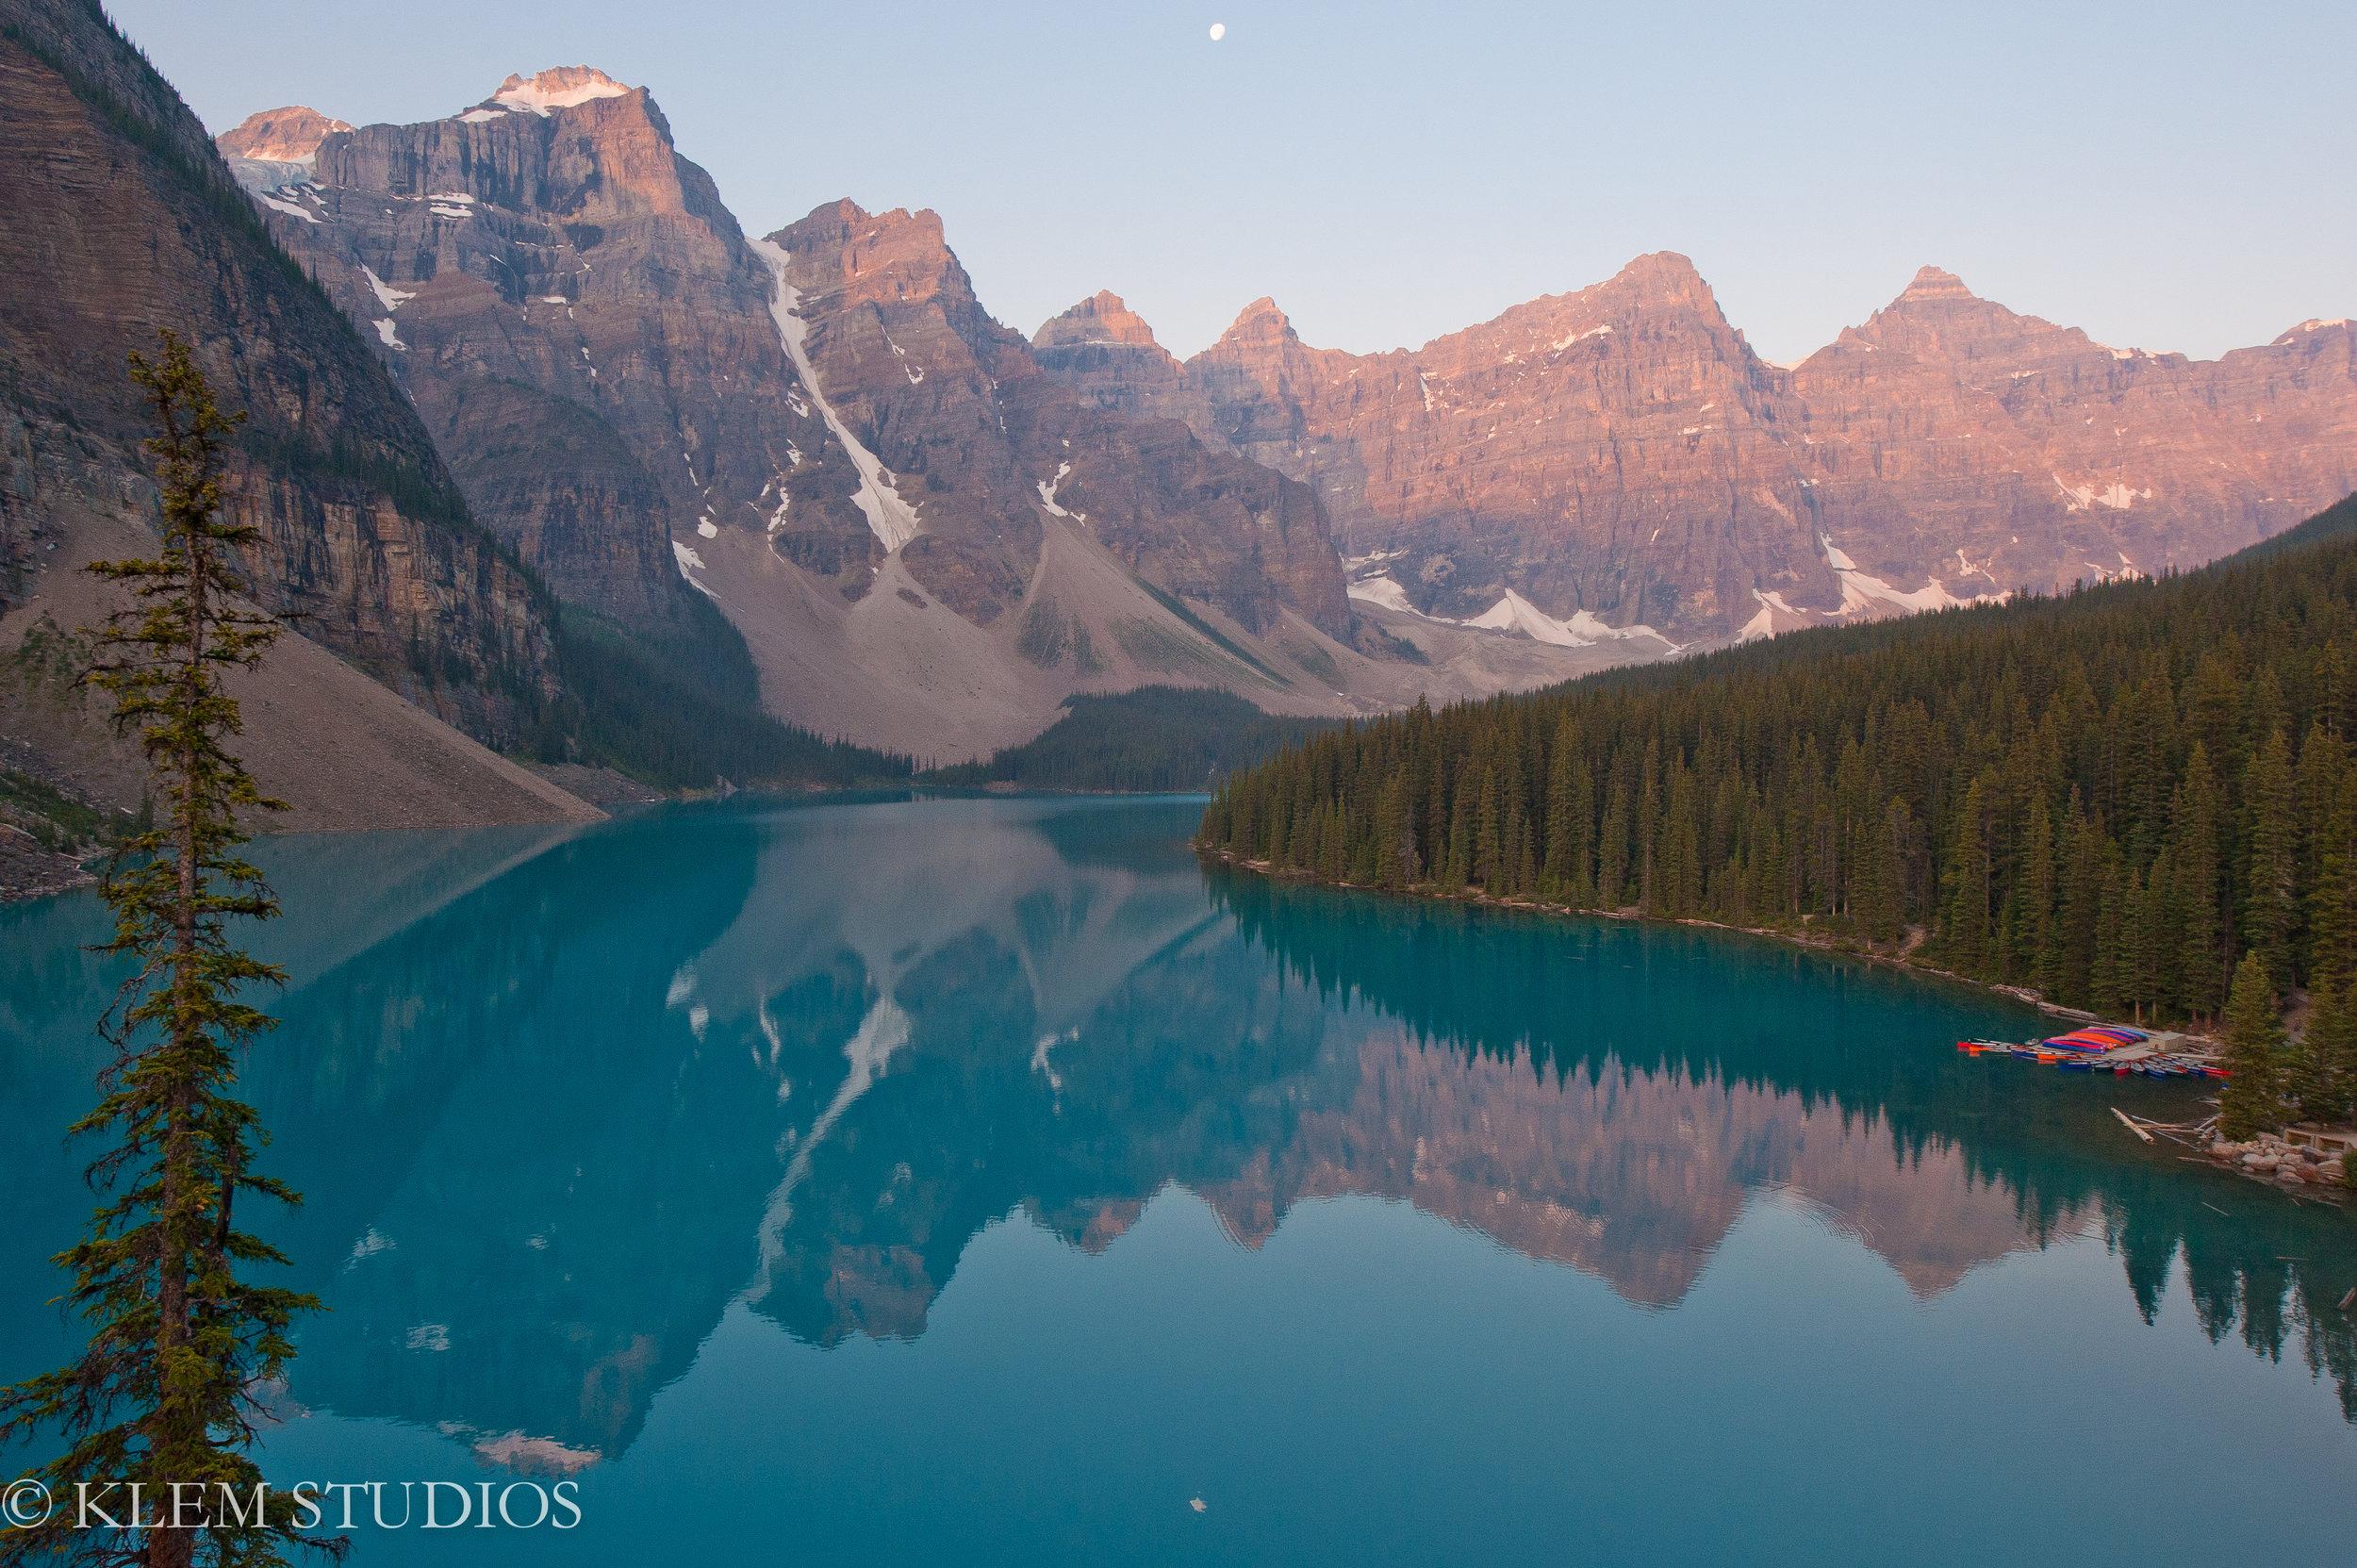 KLEM Studios Photography, Banff National Park, Alberta, Canada